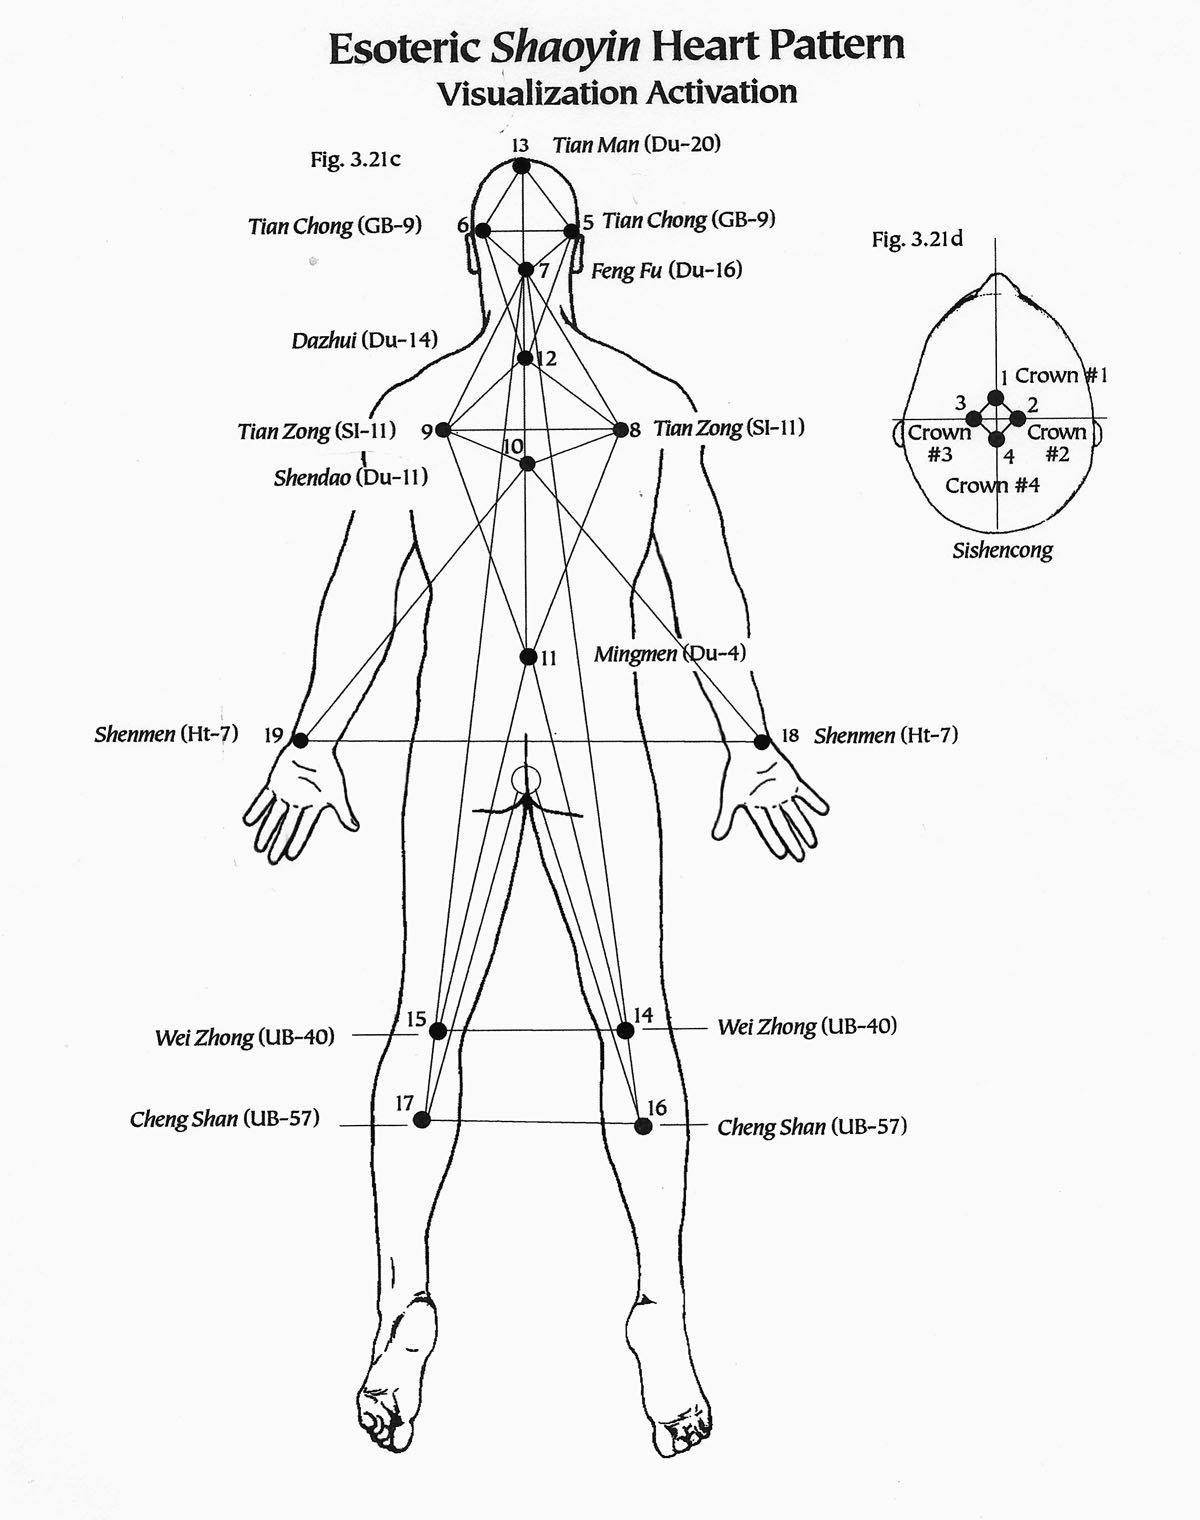 Esoteric Acupuncture